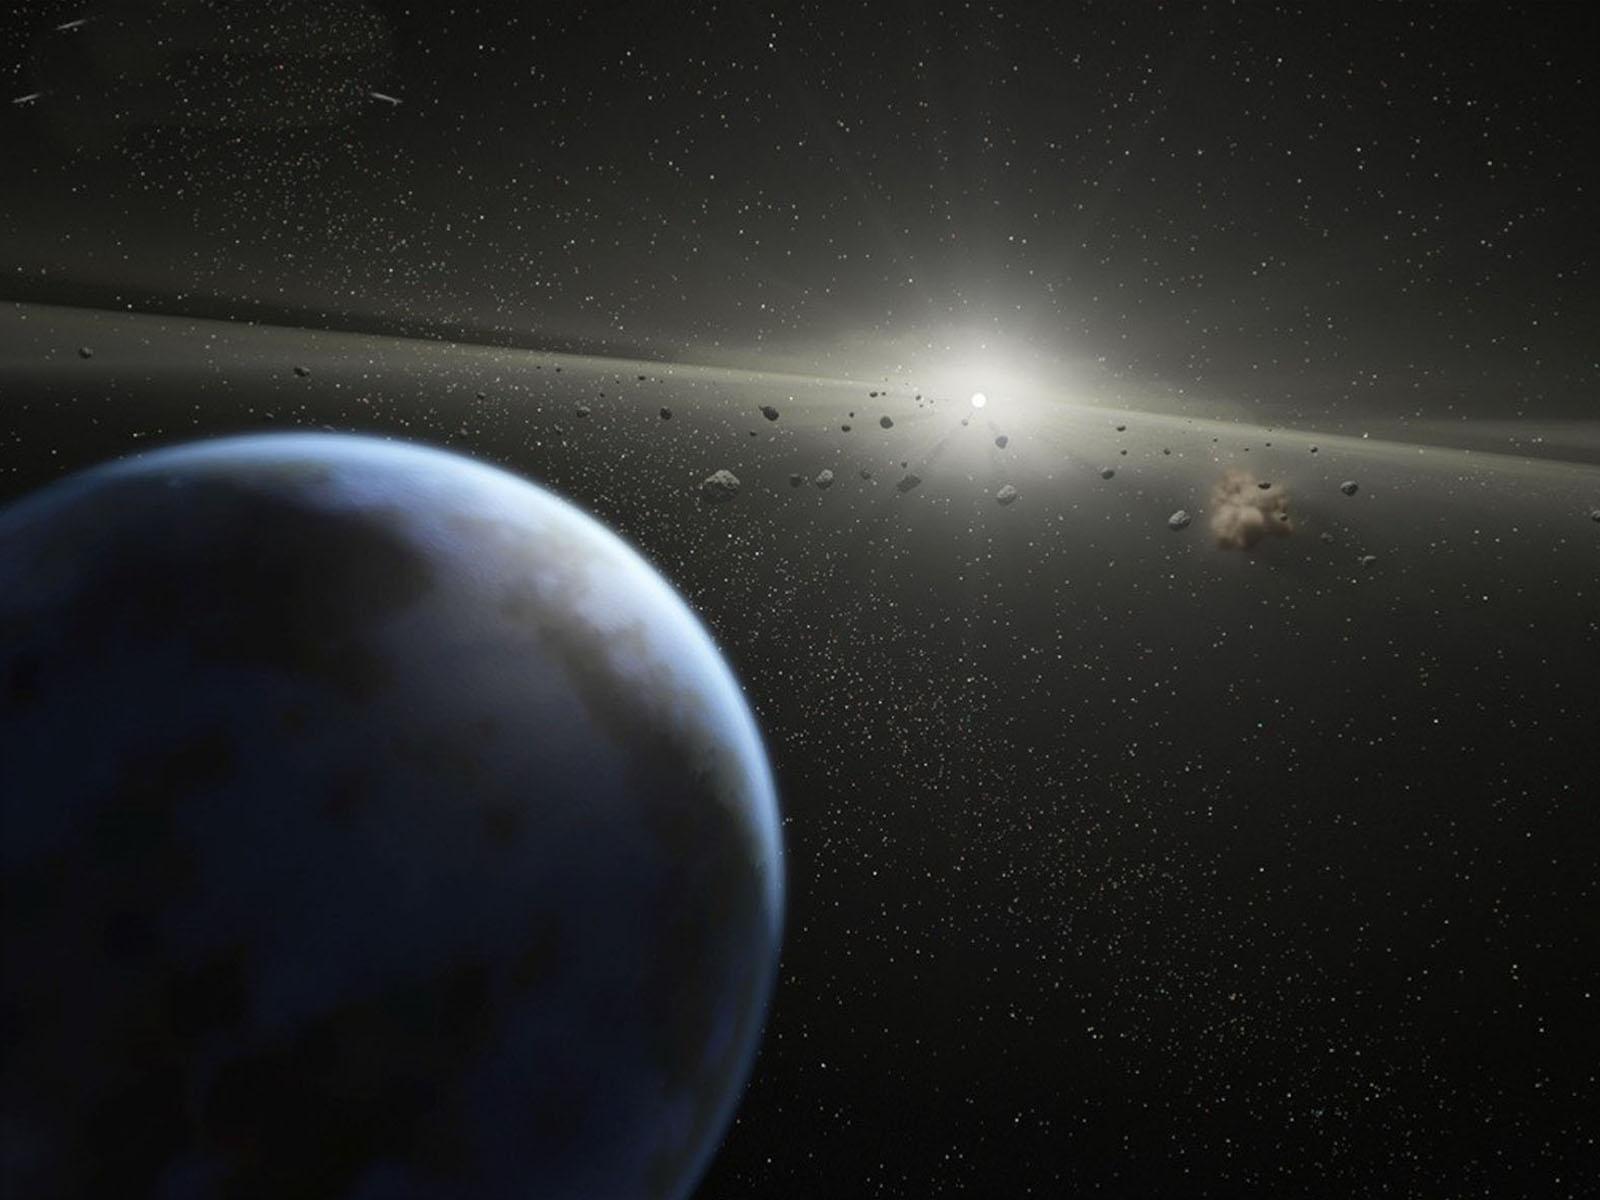 wallpapers: Asteroid Belt In Orbit